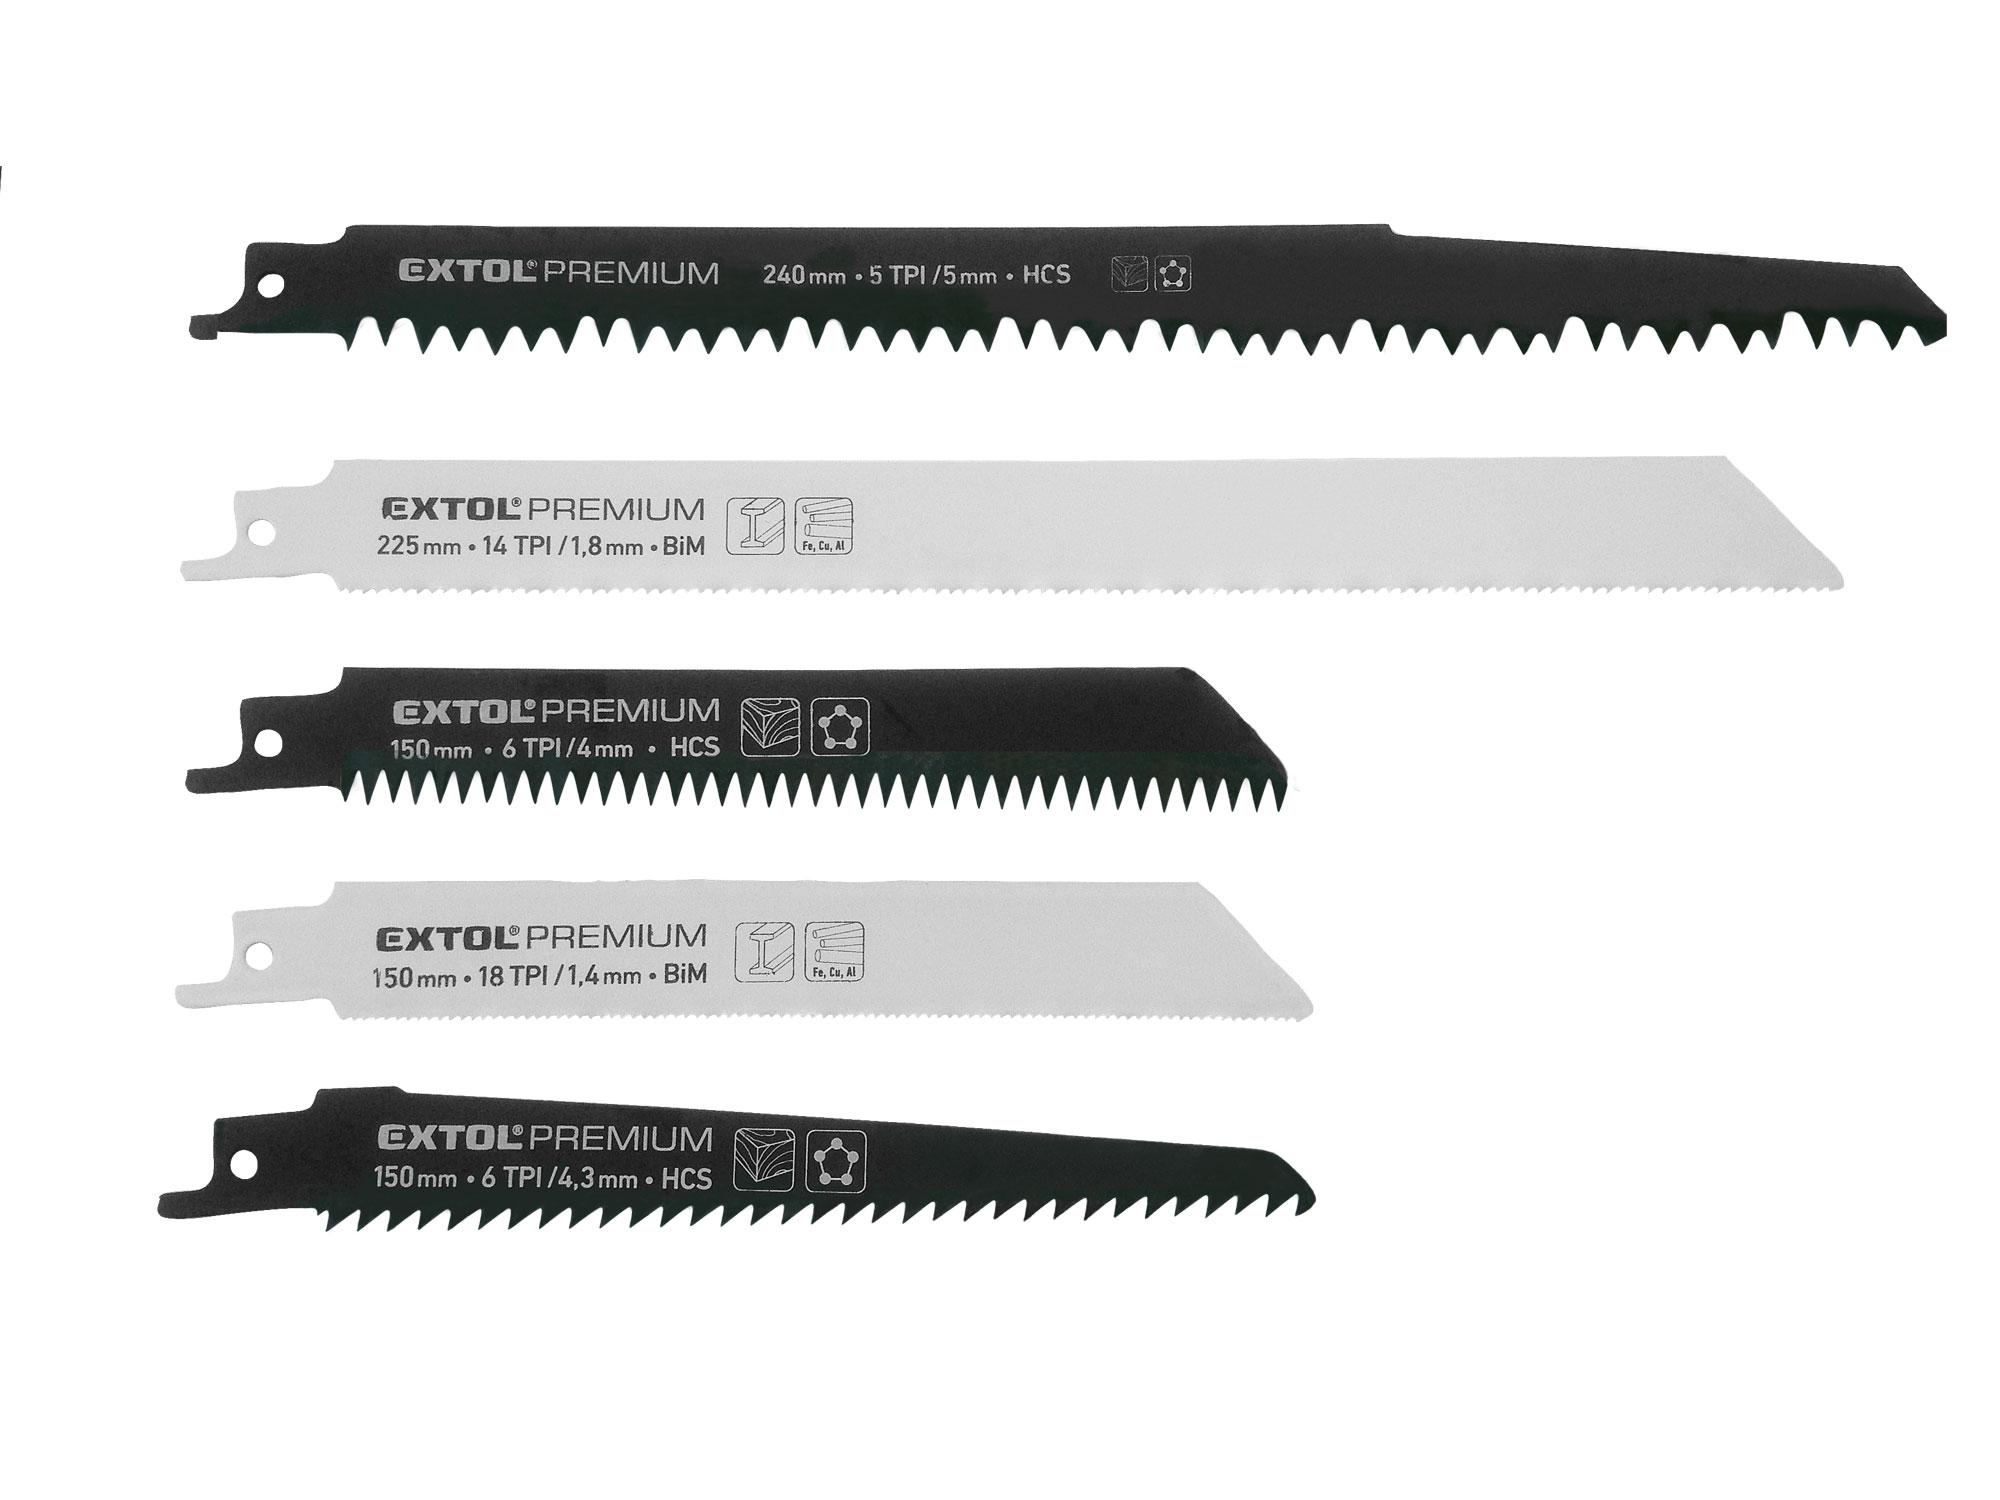 5pcs Sabre/Reciprocating Saw Blade Set, HCS, BIM